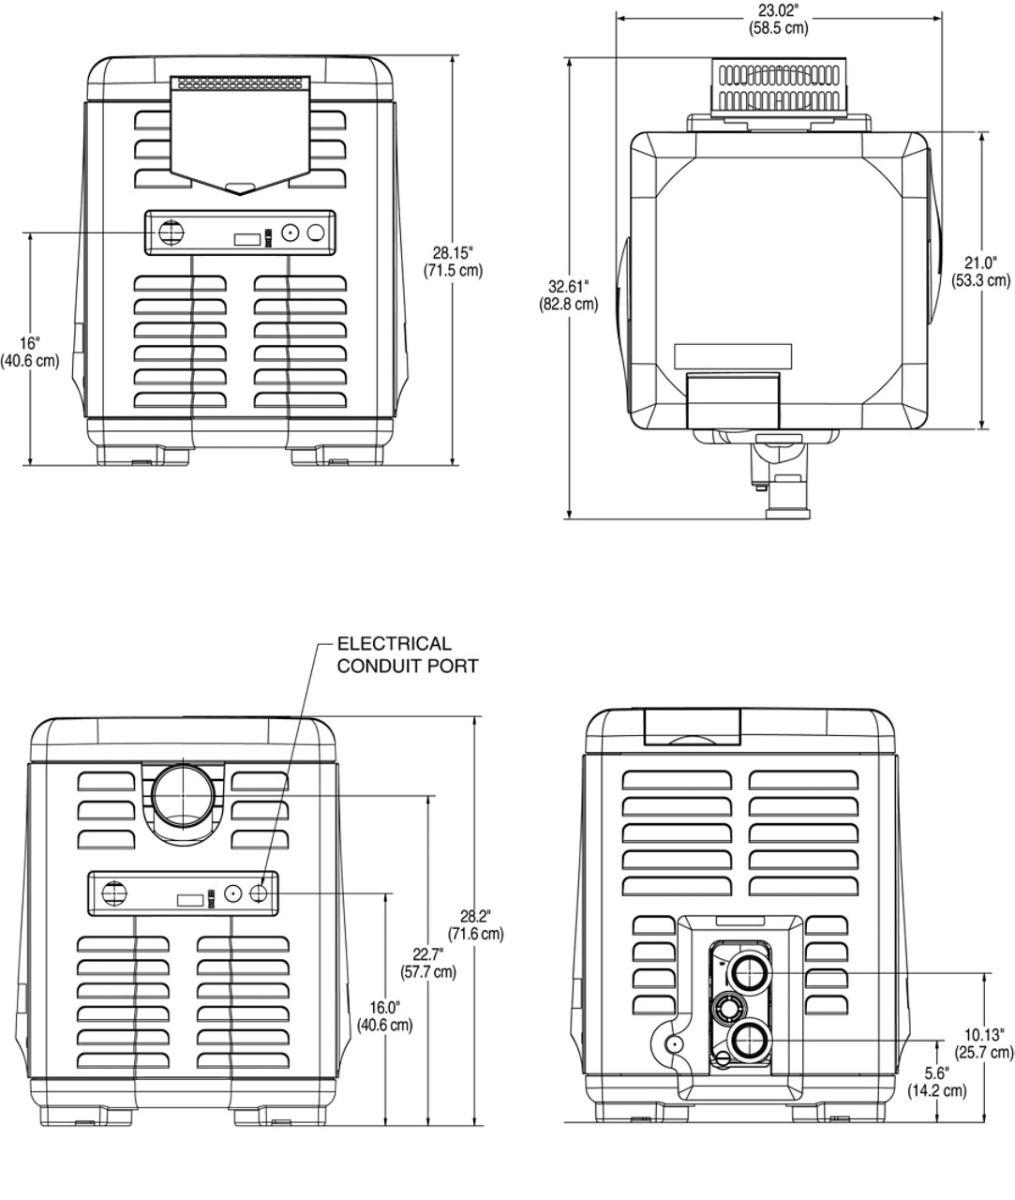 Pentair Mastertemp High Performance Gas Heater 460736